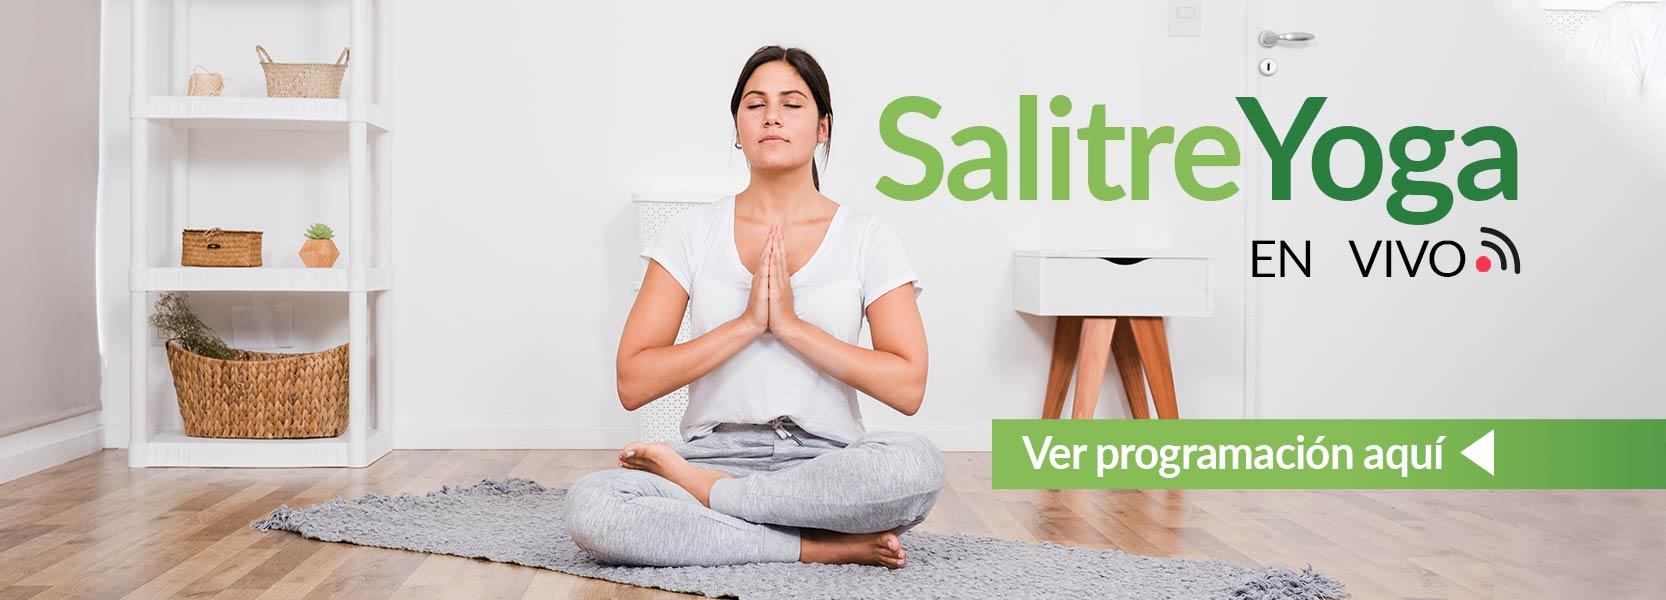 Salitre-Yoga-WEB